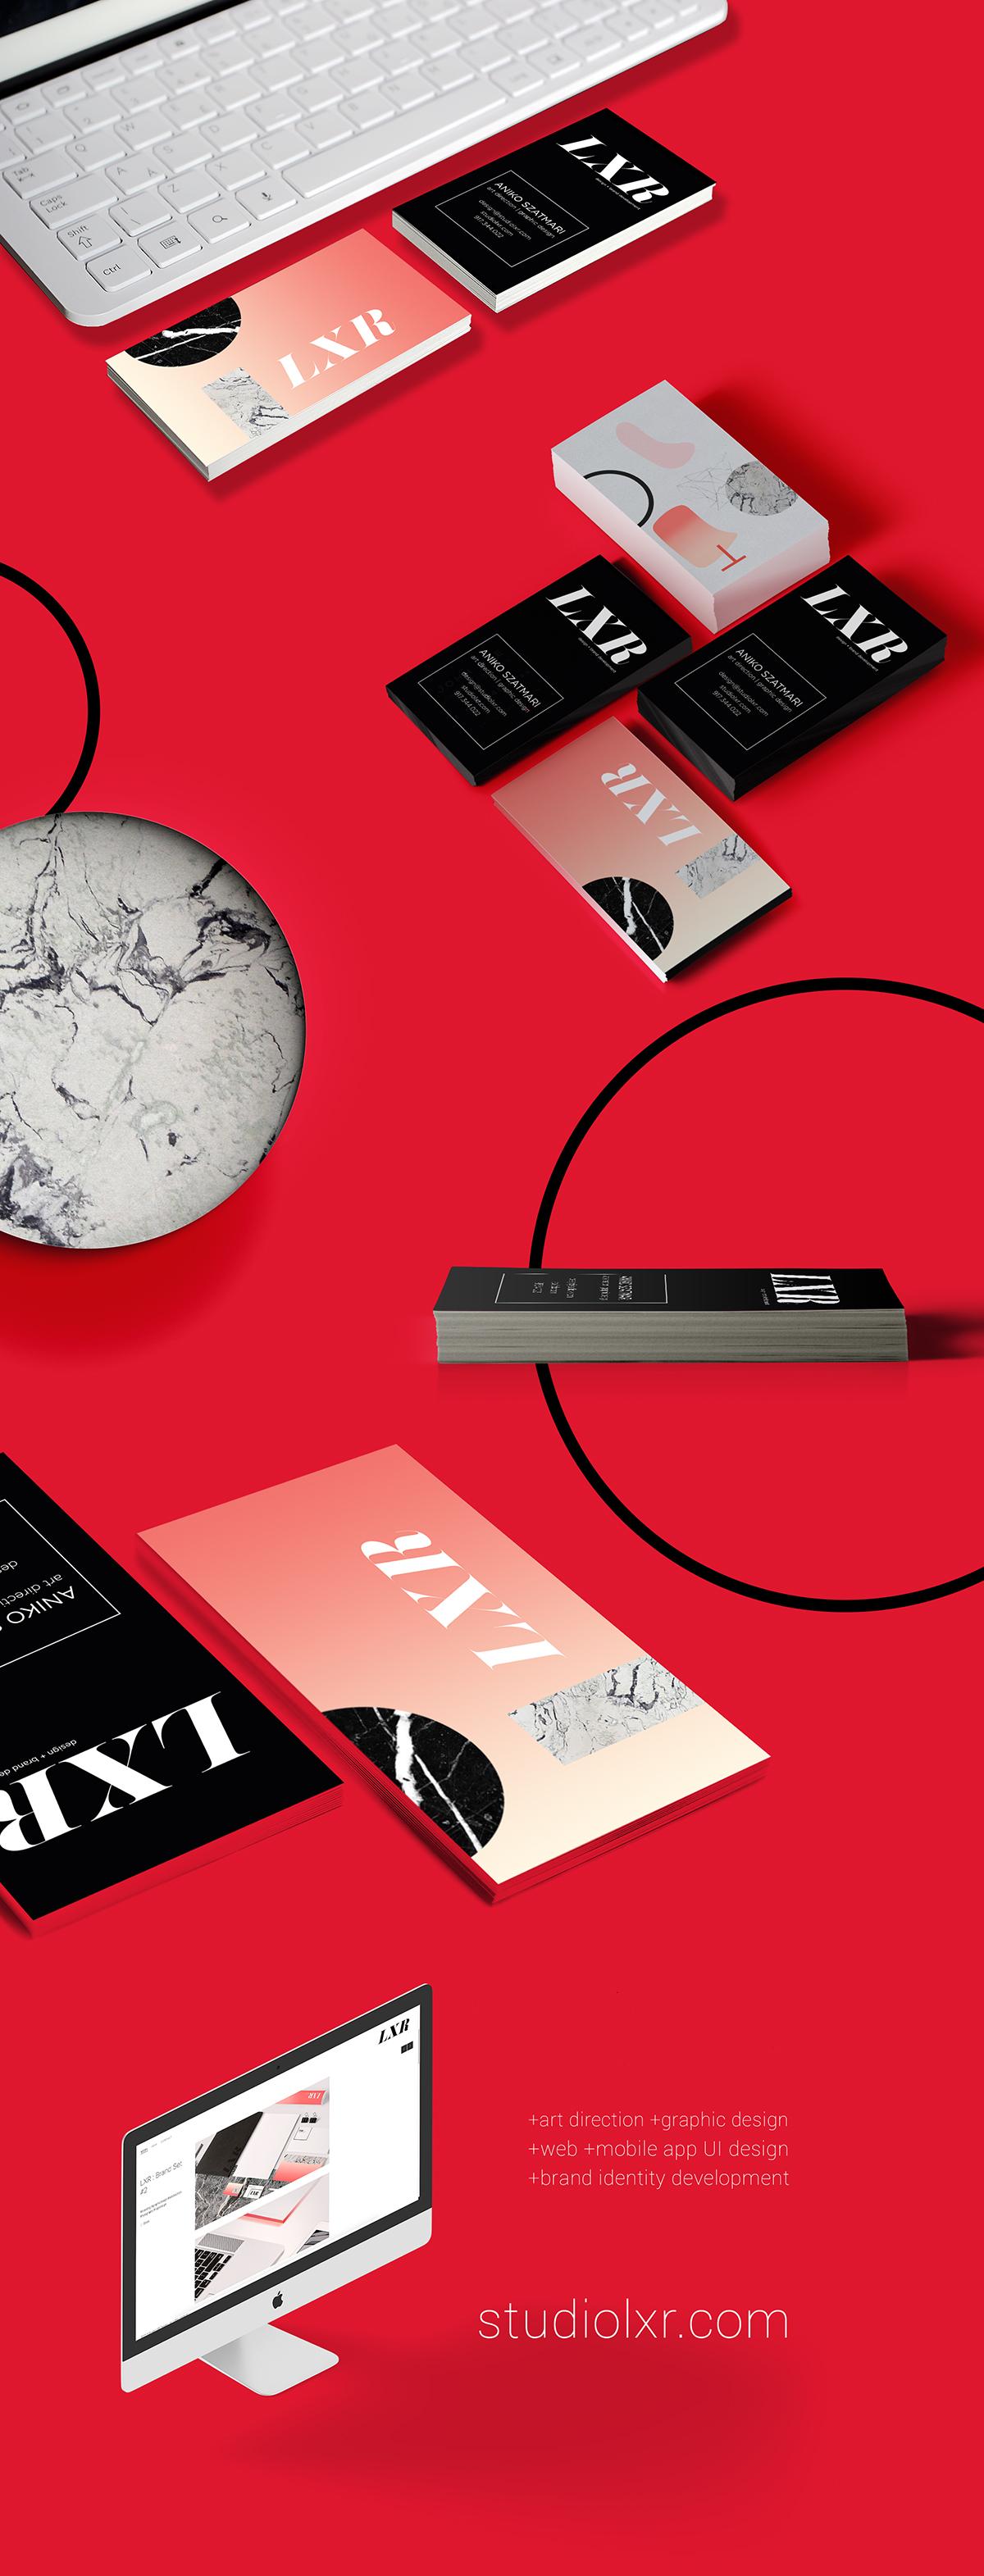 studio-lxr-design-businesscard-design